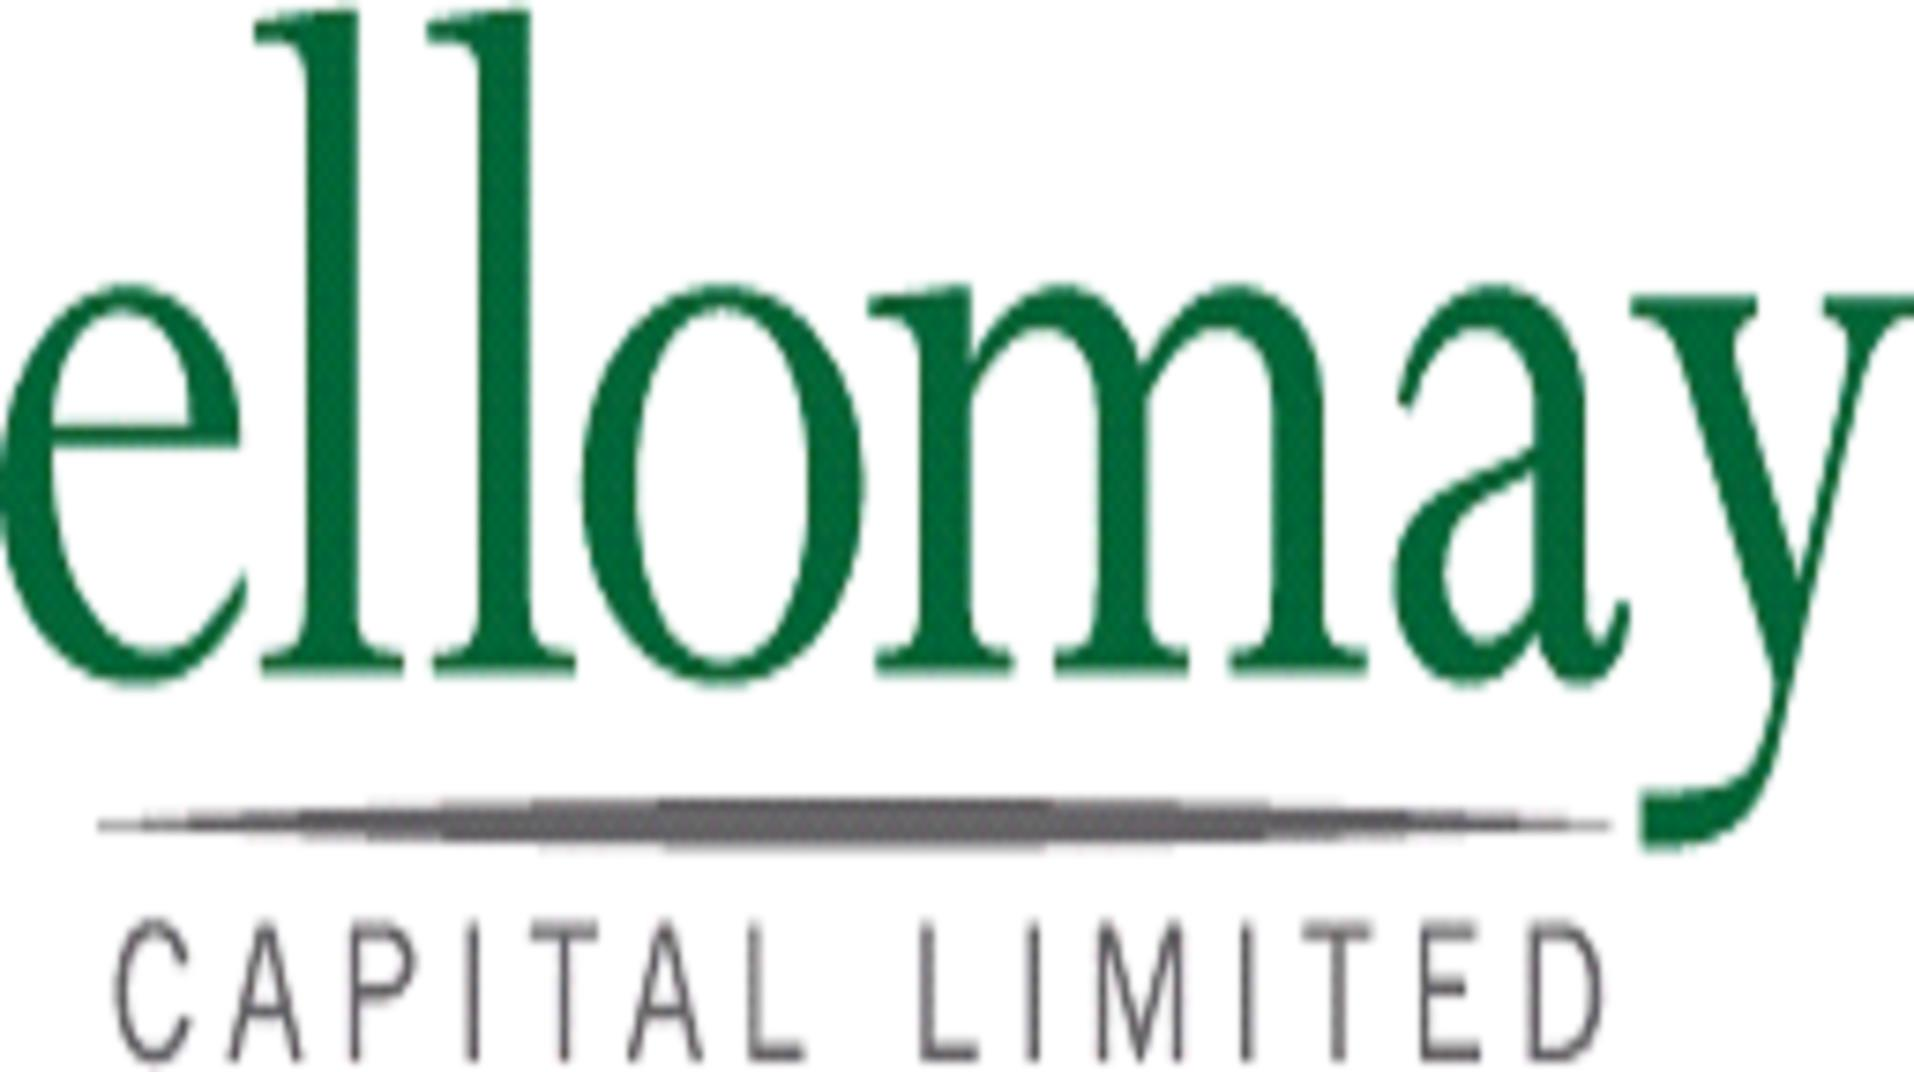 Ellomay Capital logo